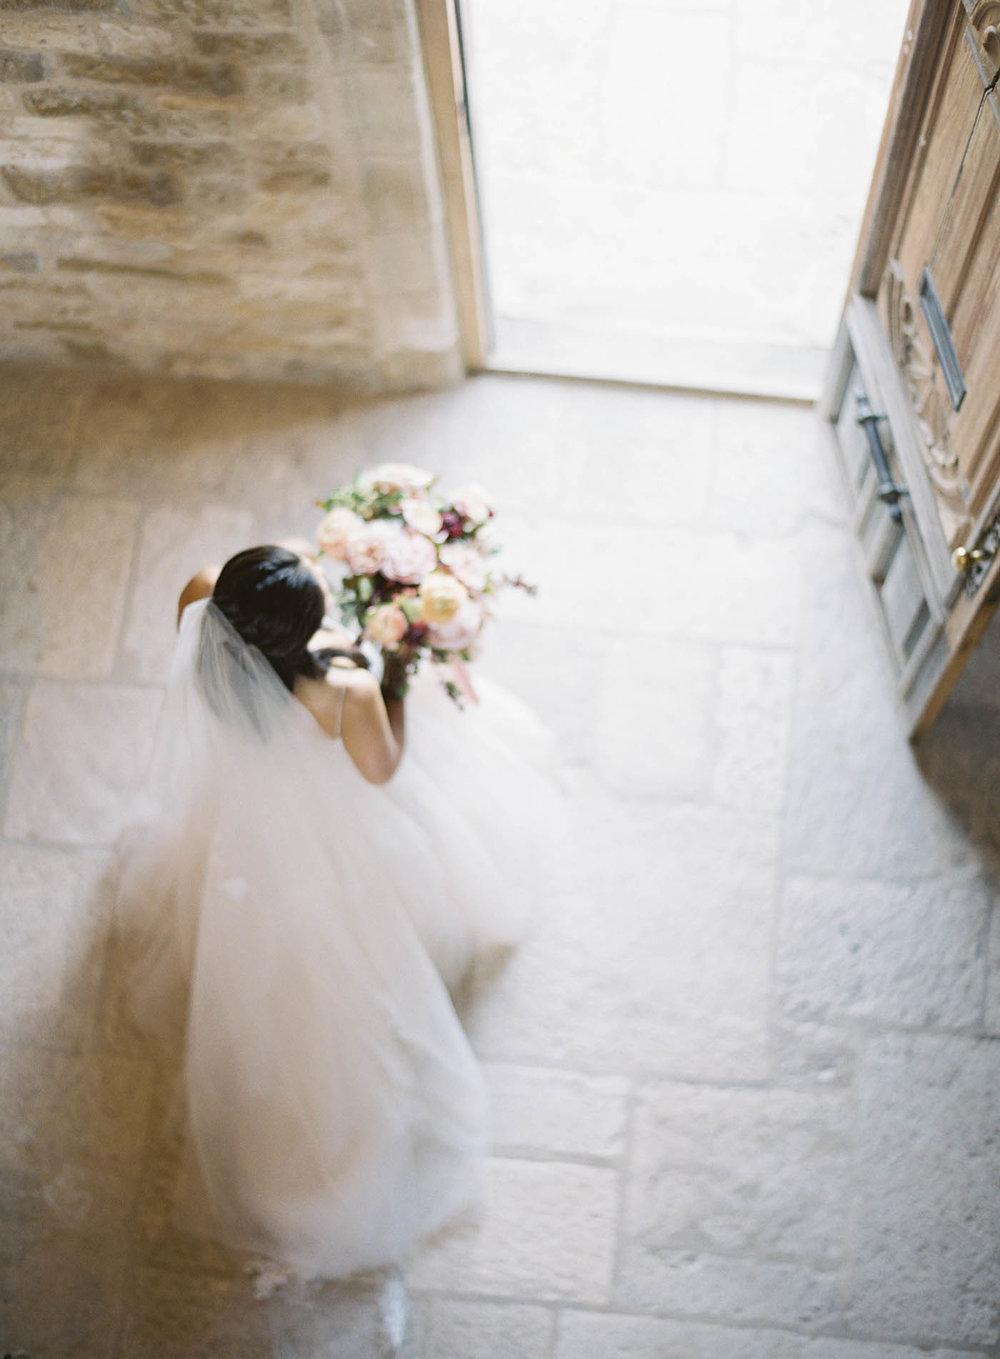 sunstone-villa-wedding-12-Jen_Huang-RD-37-Jen_Huang-009581-R1-009.jpg